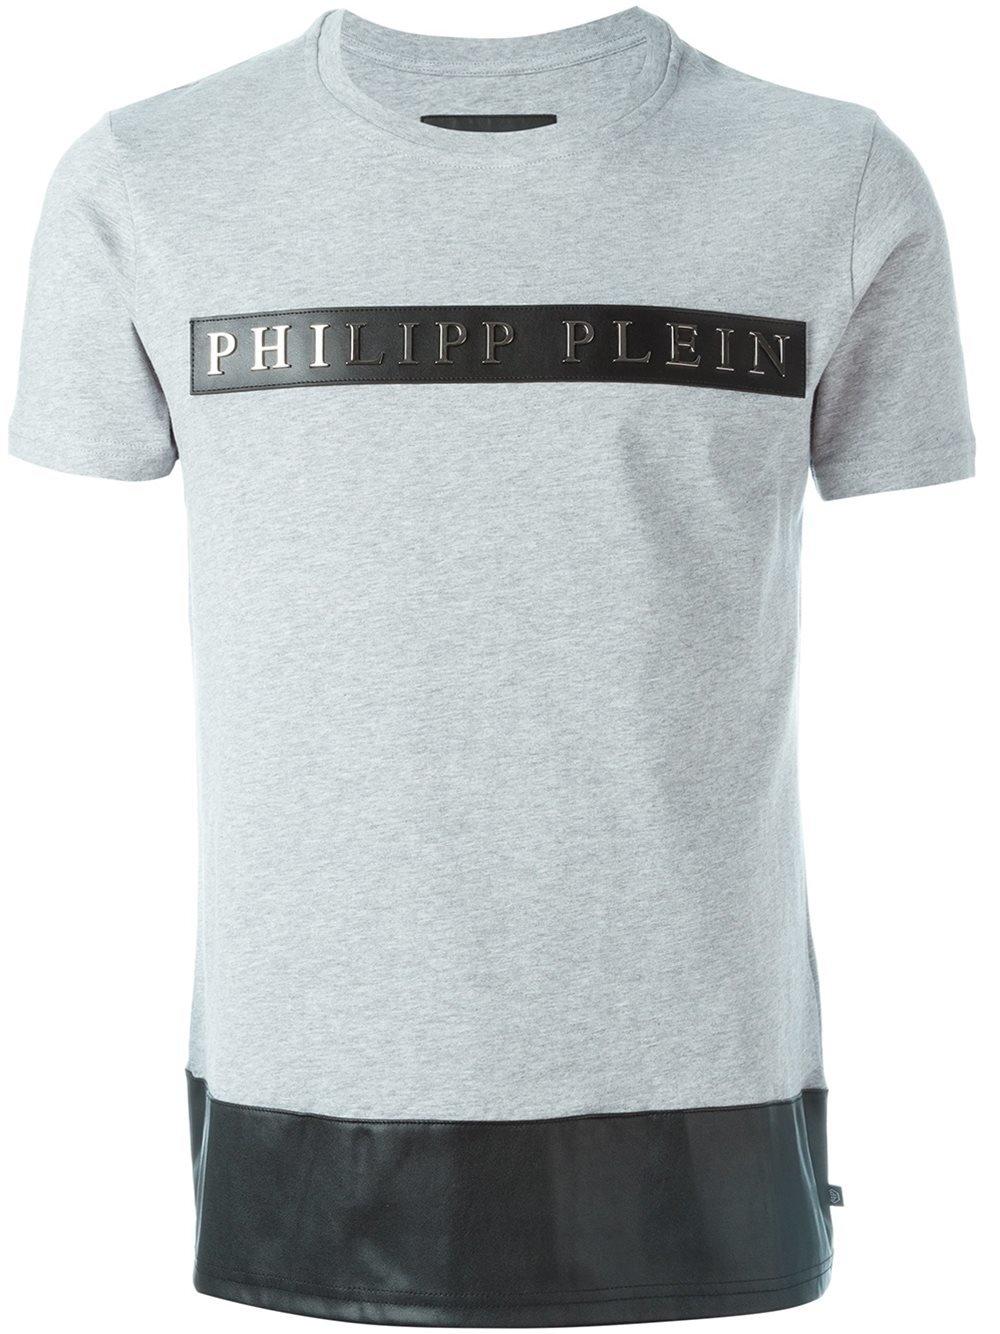 Snap Philipp Plein Escape T Shirt Nuji photos on Pinterest 3da837fbb24